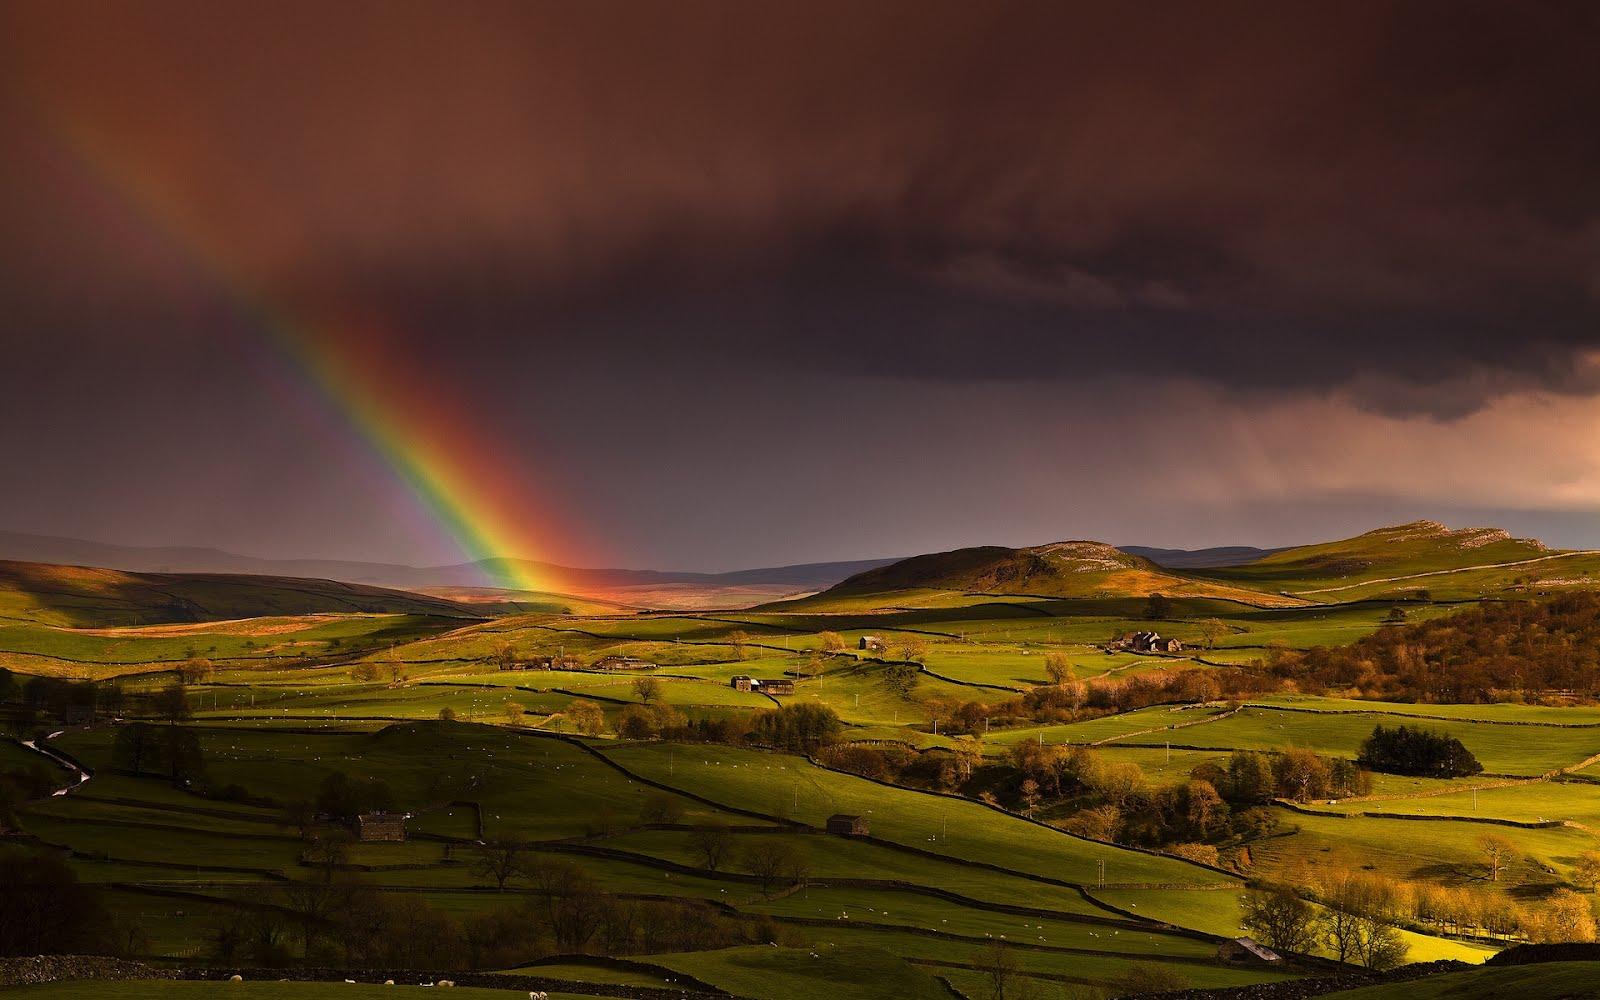 http://4.bp.blogspot.com/-aLRNNqyDZpo/T-nk90LhW3I/AAAAAAAA9rE/JCWB0cBPLWs/s1600/rainbow-landscape-1920x1200-wallpaper-arcoiris-sobre-el-paisaje.jpg